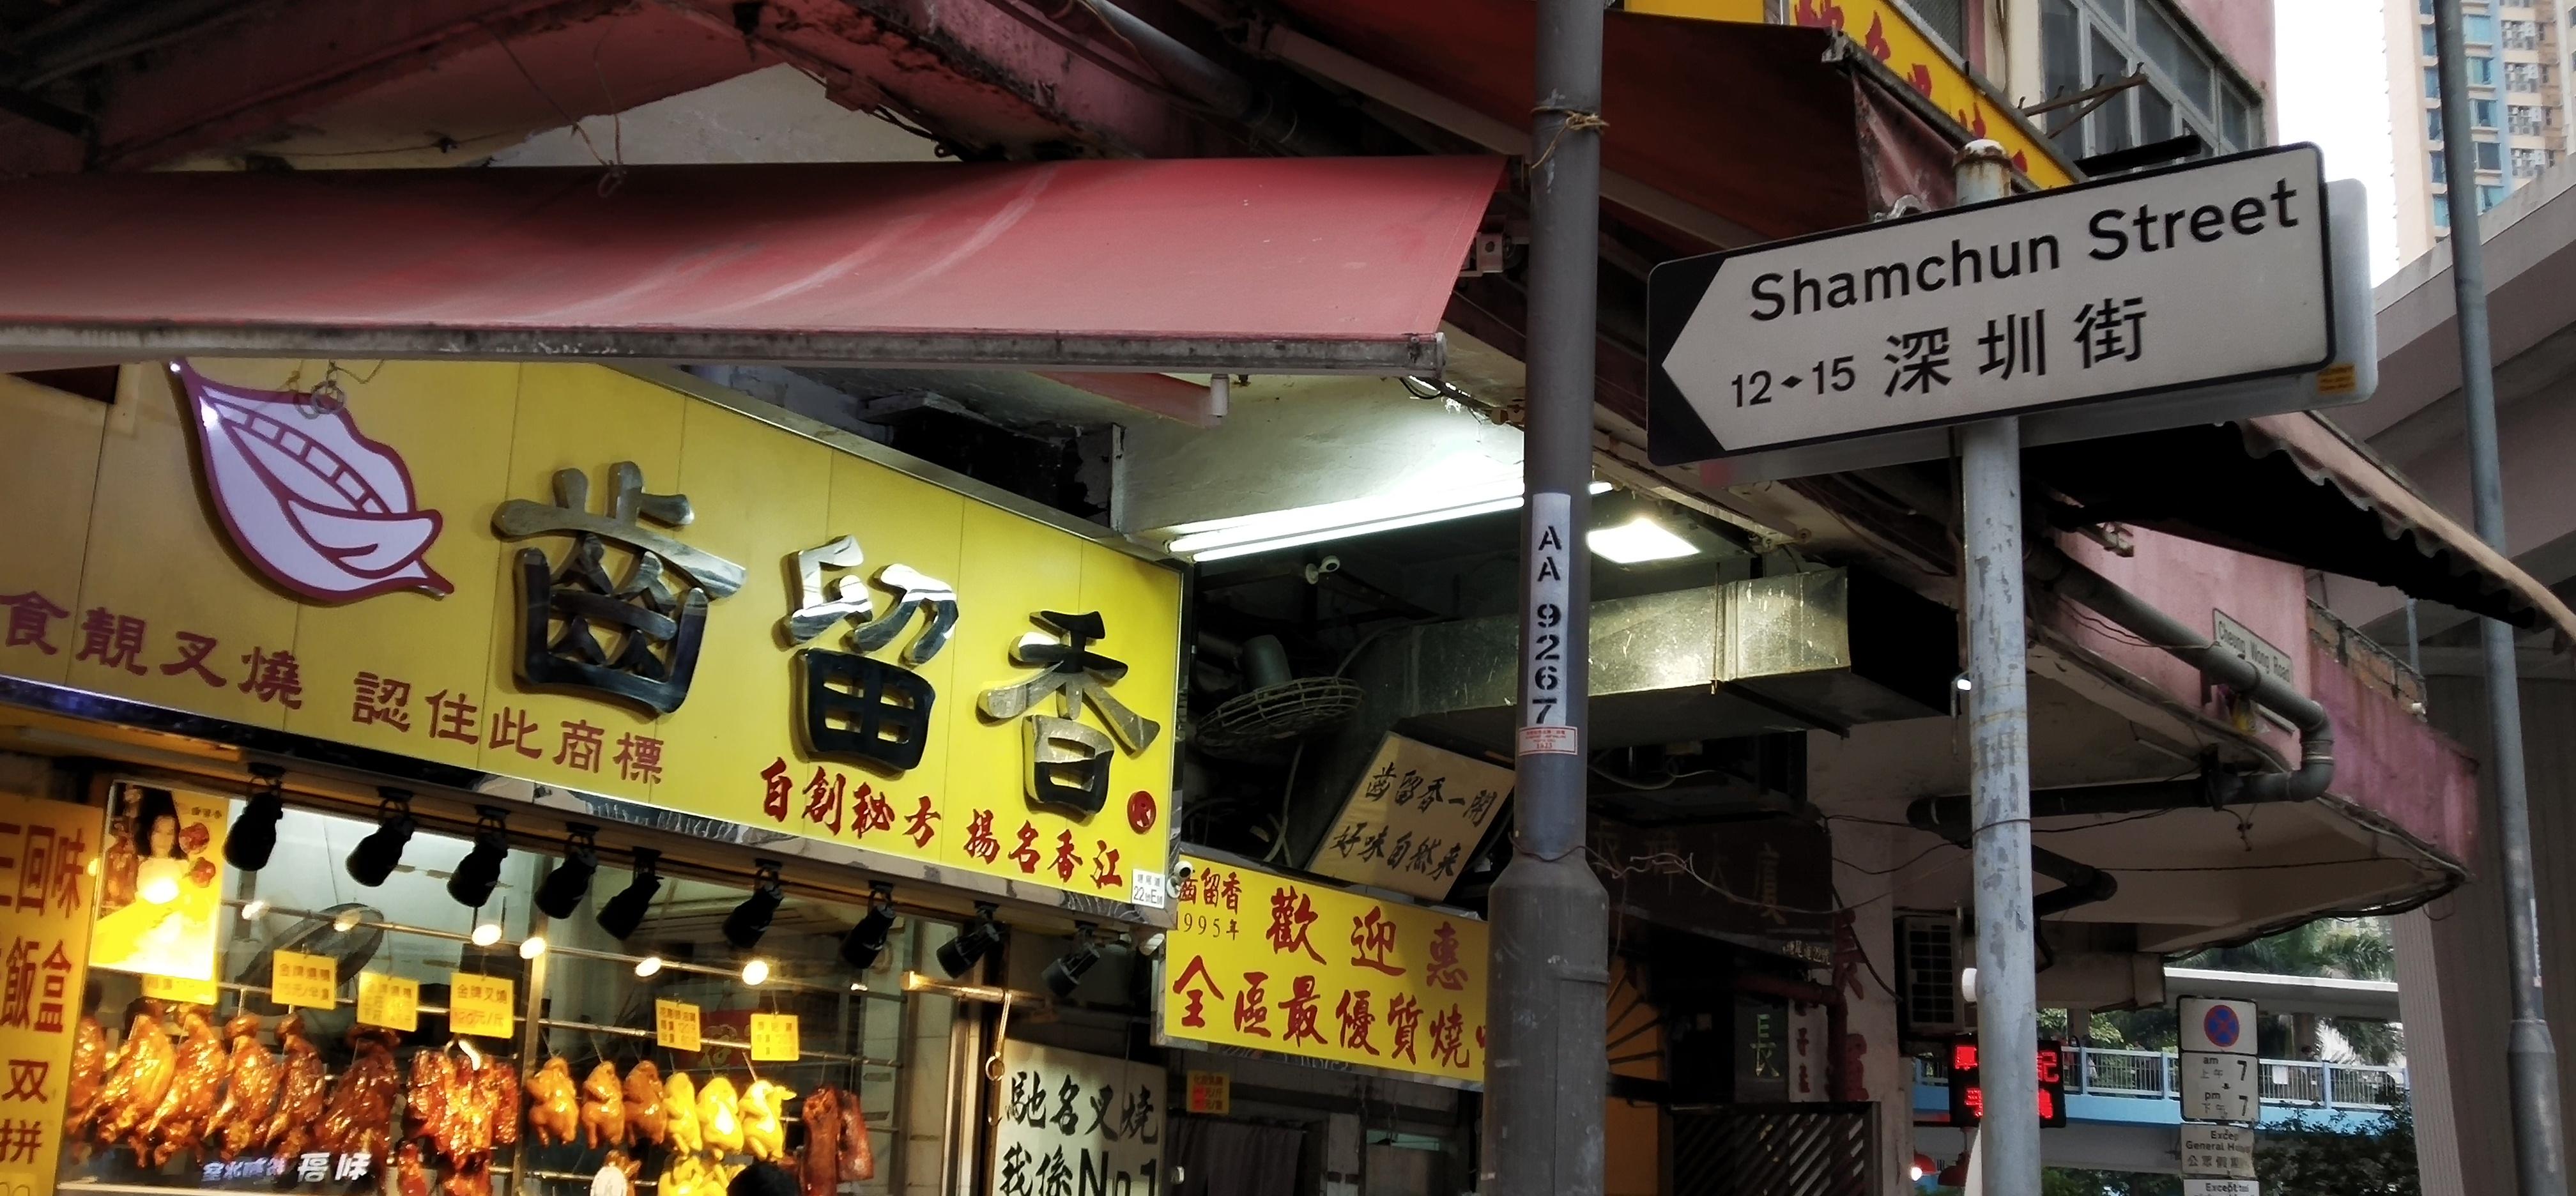 Sham Chun Street's cooked food shop.